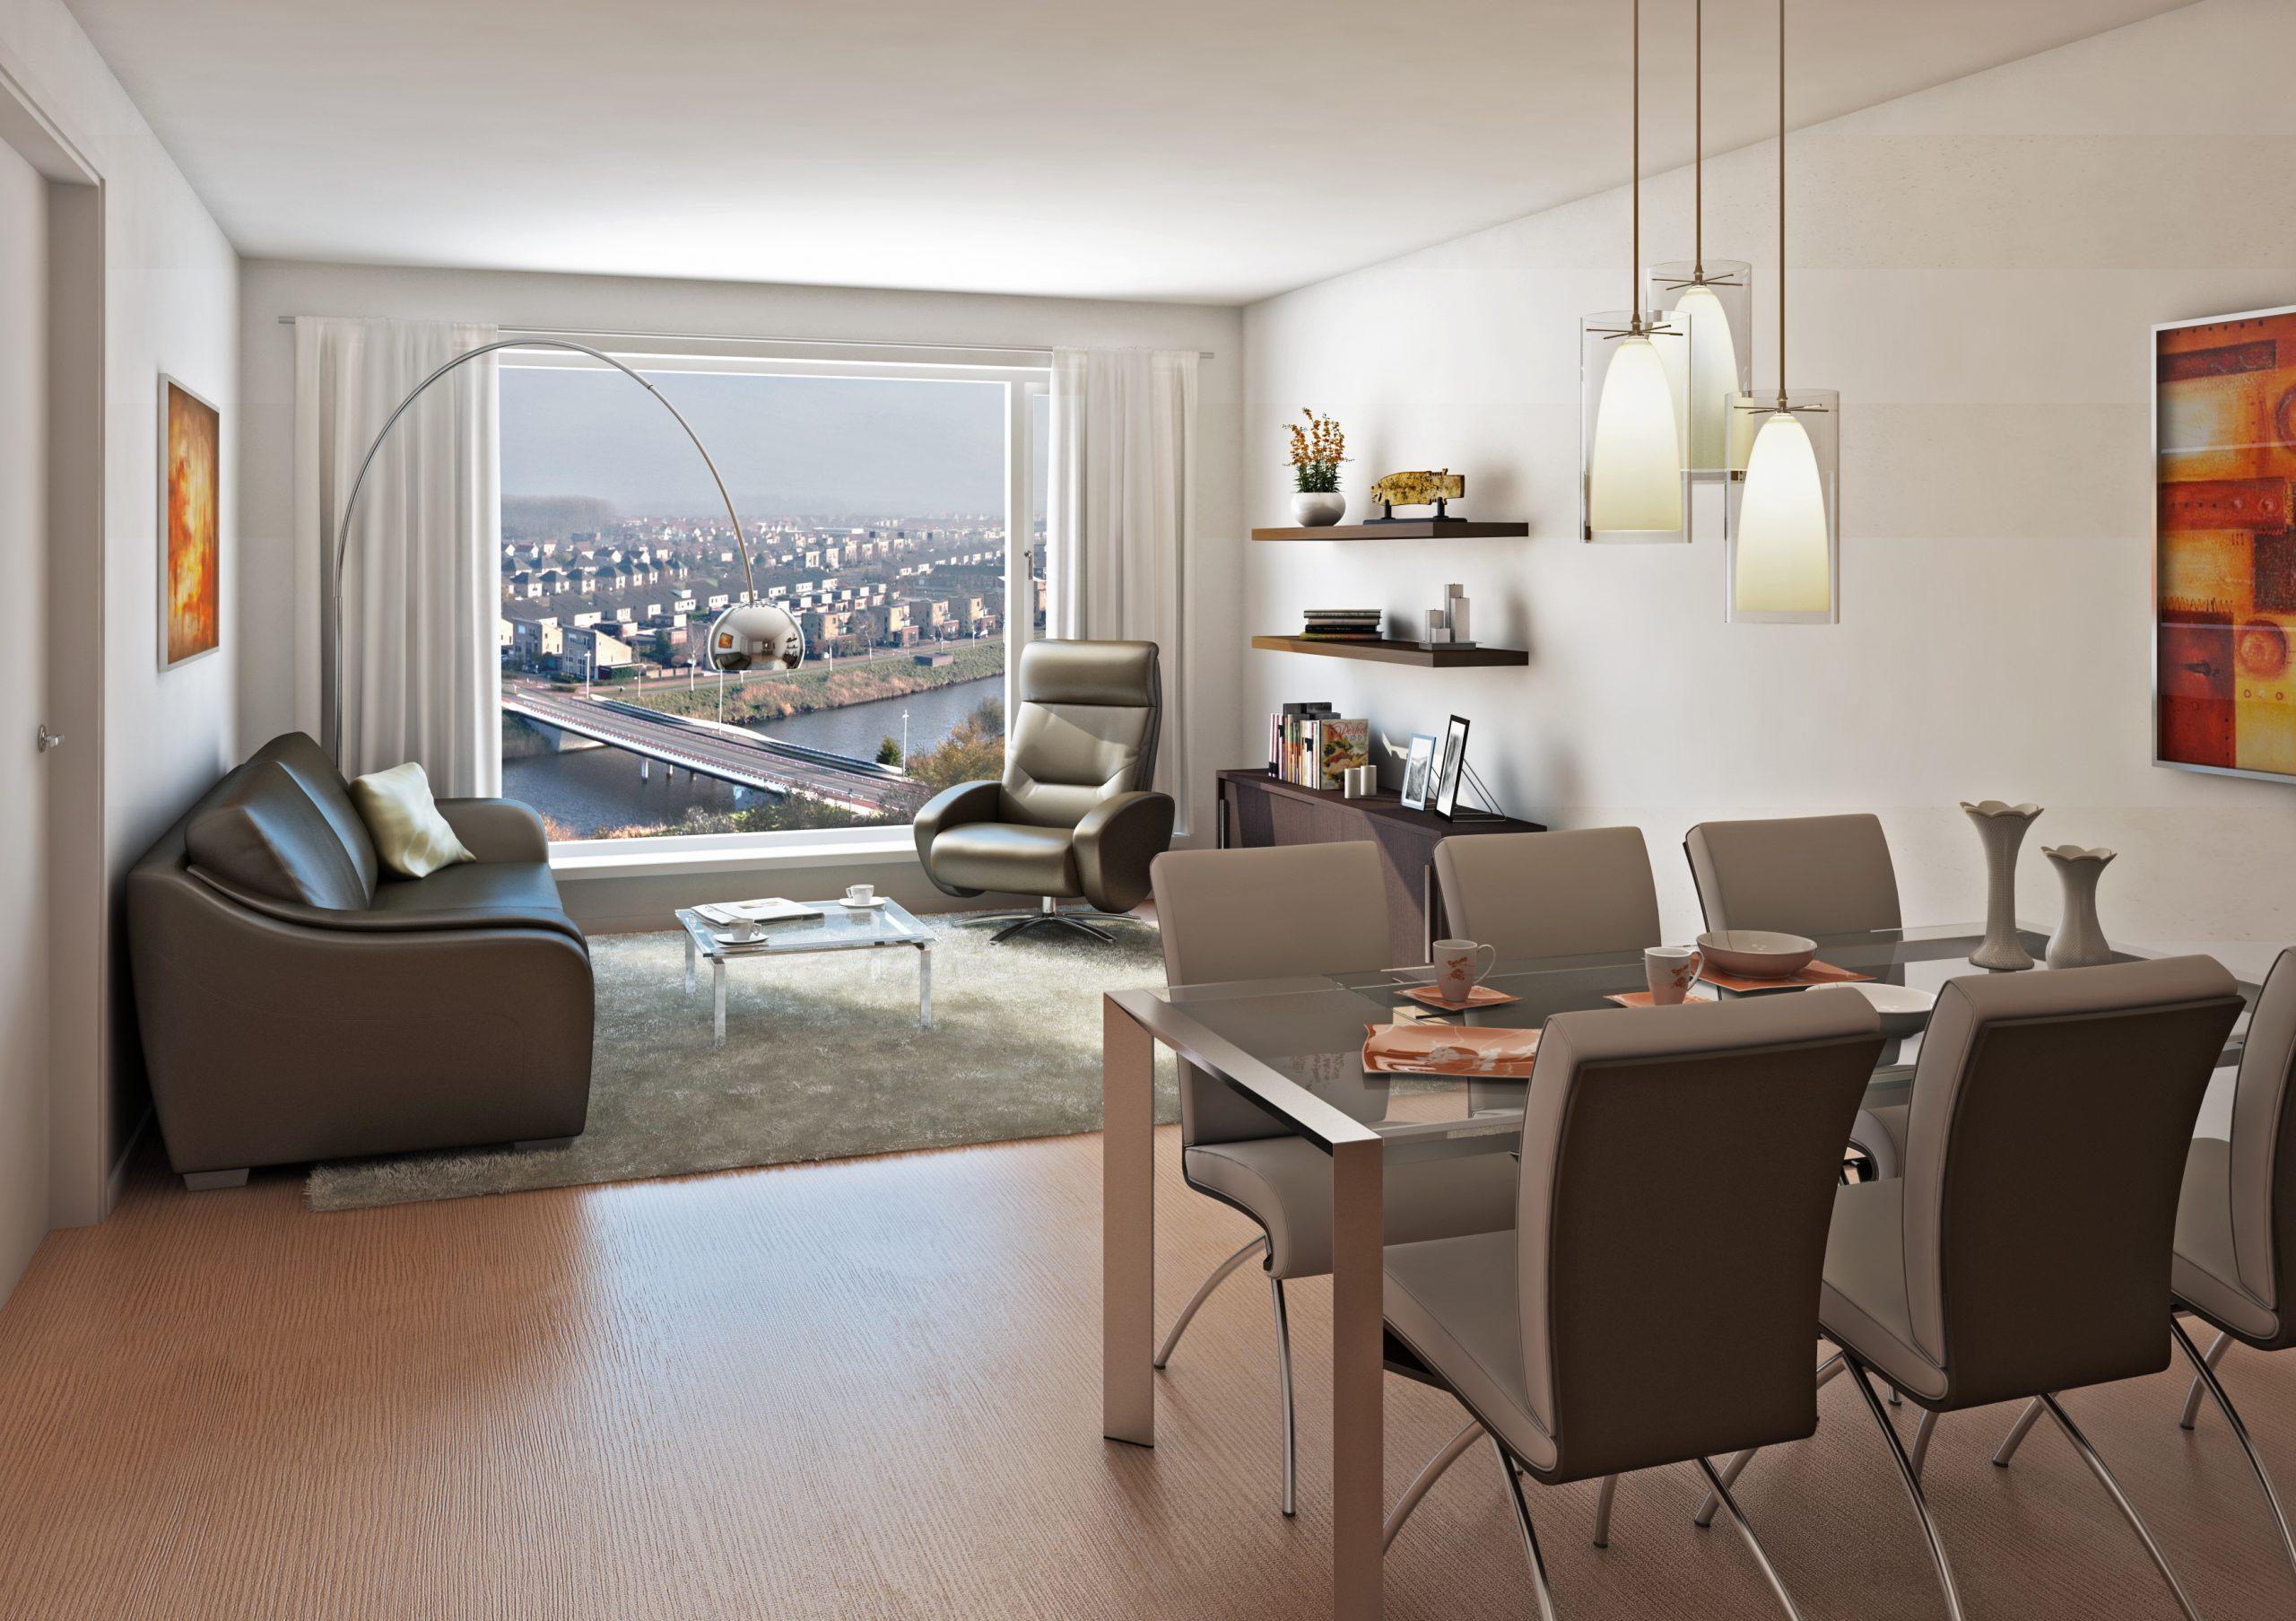 Maxima – Appartement type 1 HR_v2 modsa